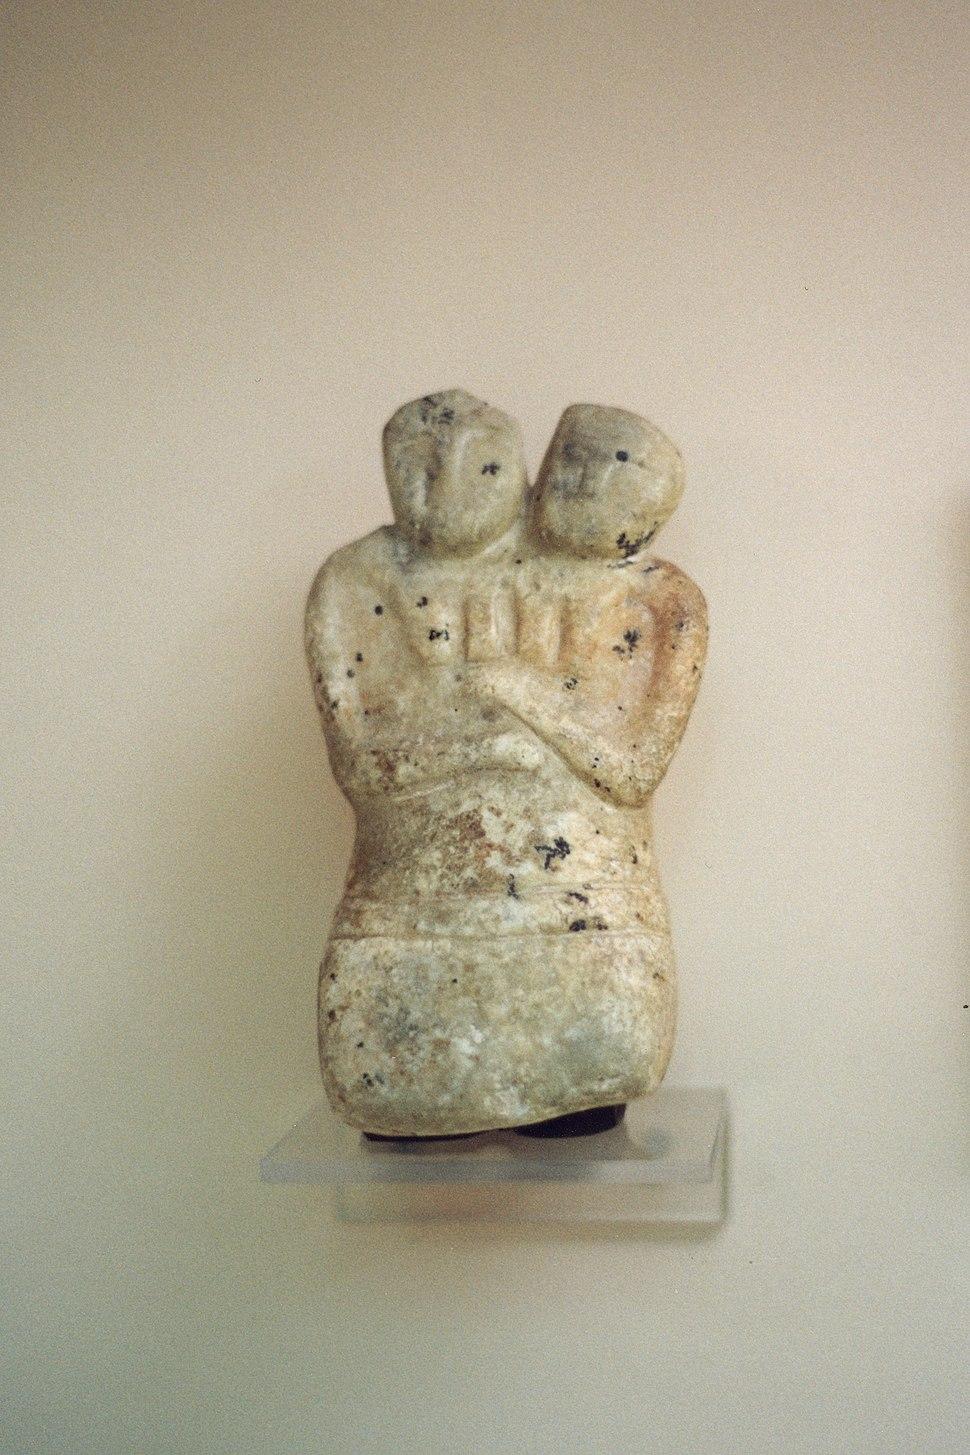 Twin goddess, marble statuette, Çatalhöyük, 6000-5500 BC, MACA, 99031